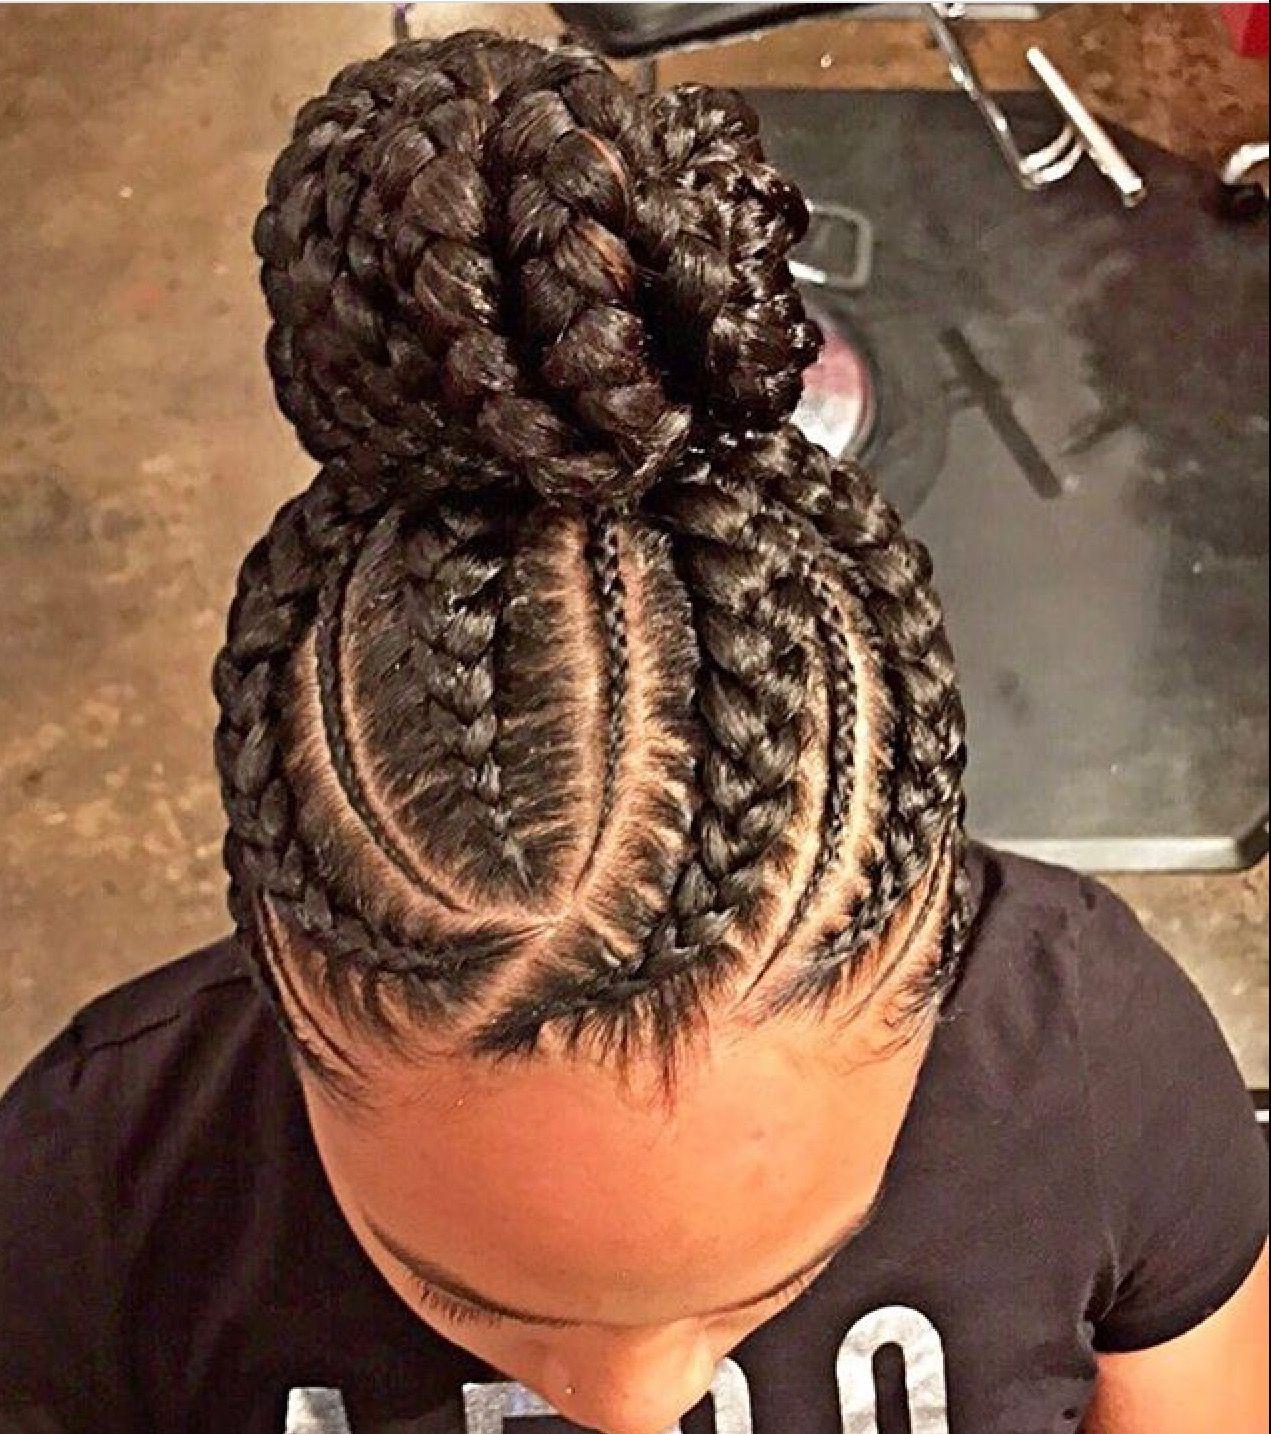 How To Create Ghana Cornrow Braids For Beginners hairstyleforblackwomen.net 48